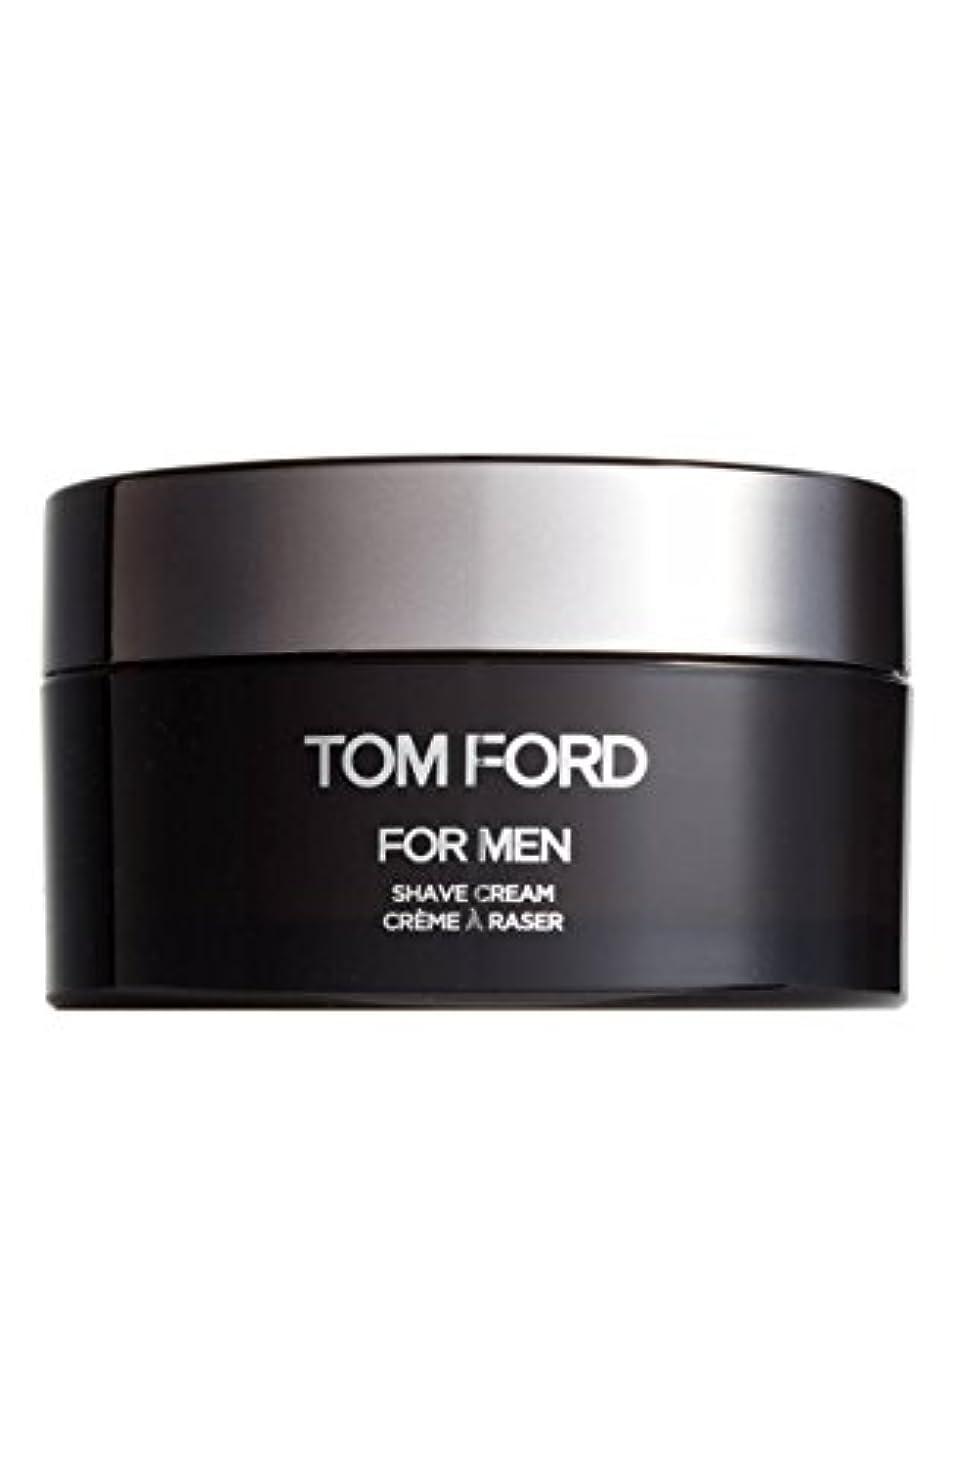 Tom Ford Shave Cream (トムフォード シェーブ クリーム) 5.6 oz (165ml) シェーブ クリーム for Men